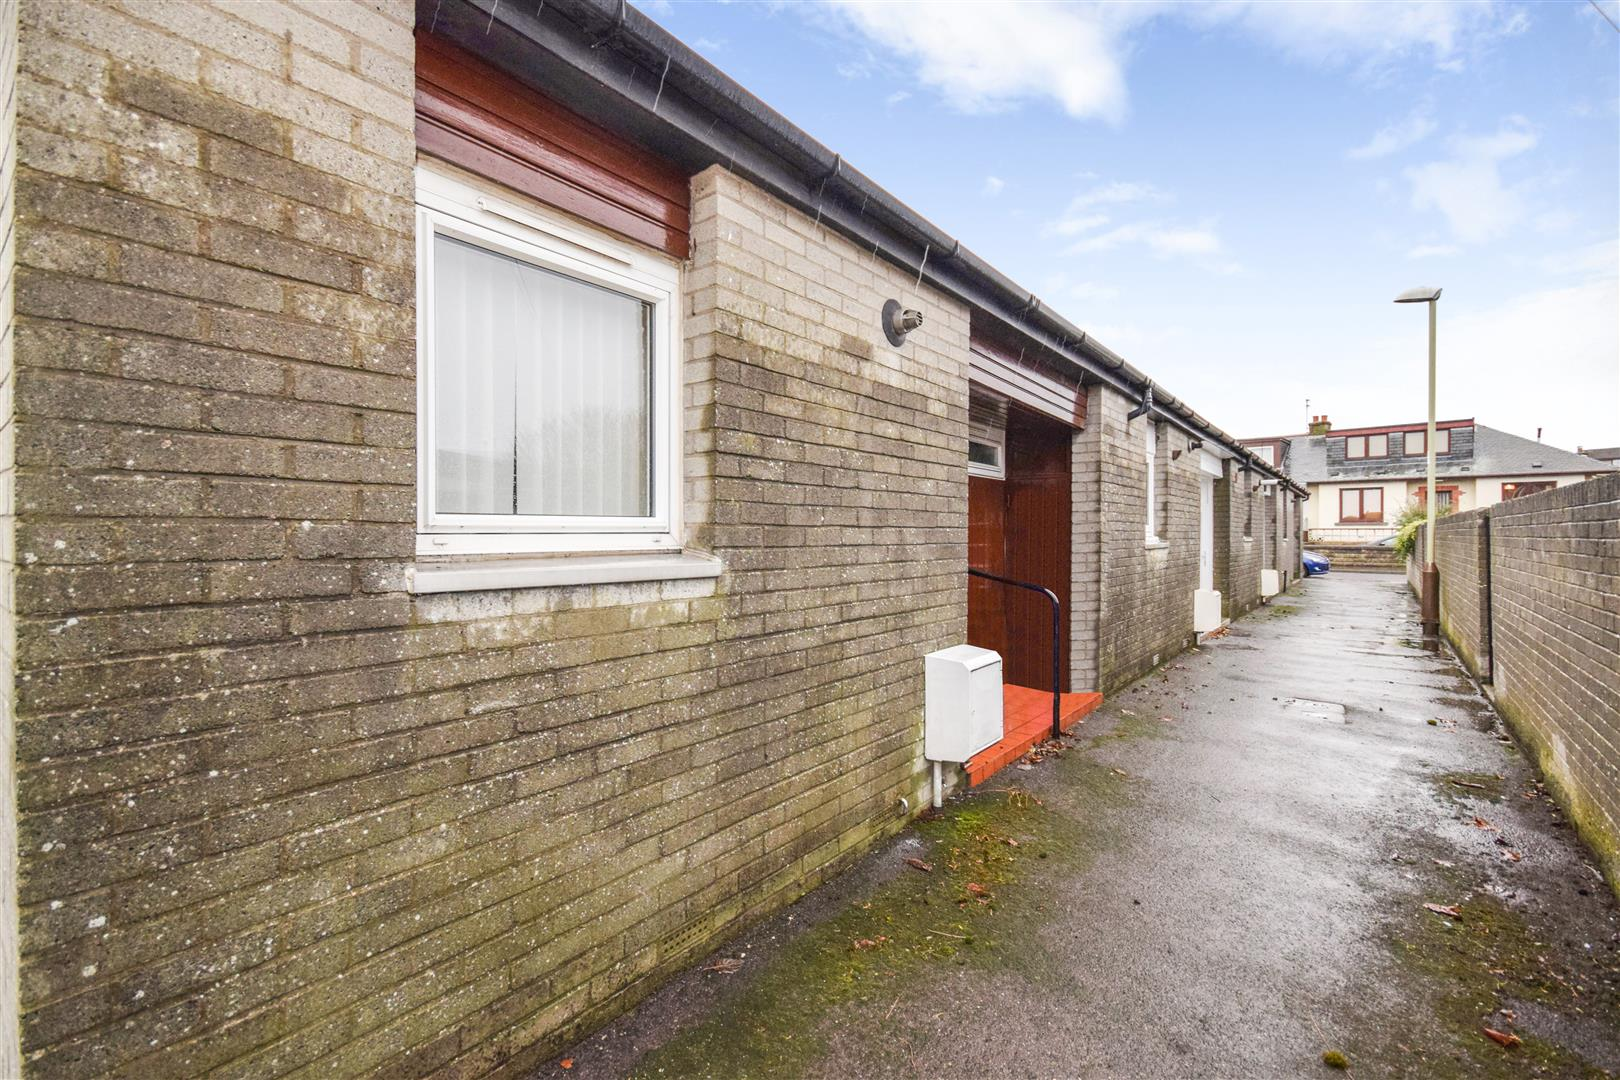 16, Milton Street, Monifieth, Dundee, Angus, DD5 4QG, UK